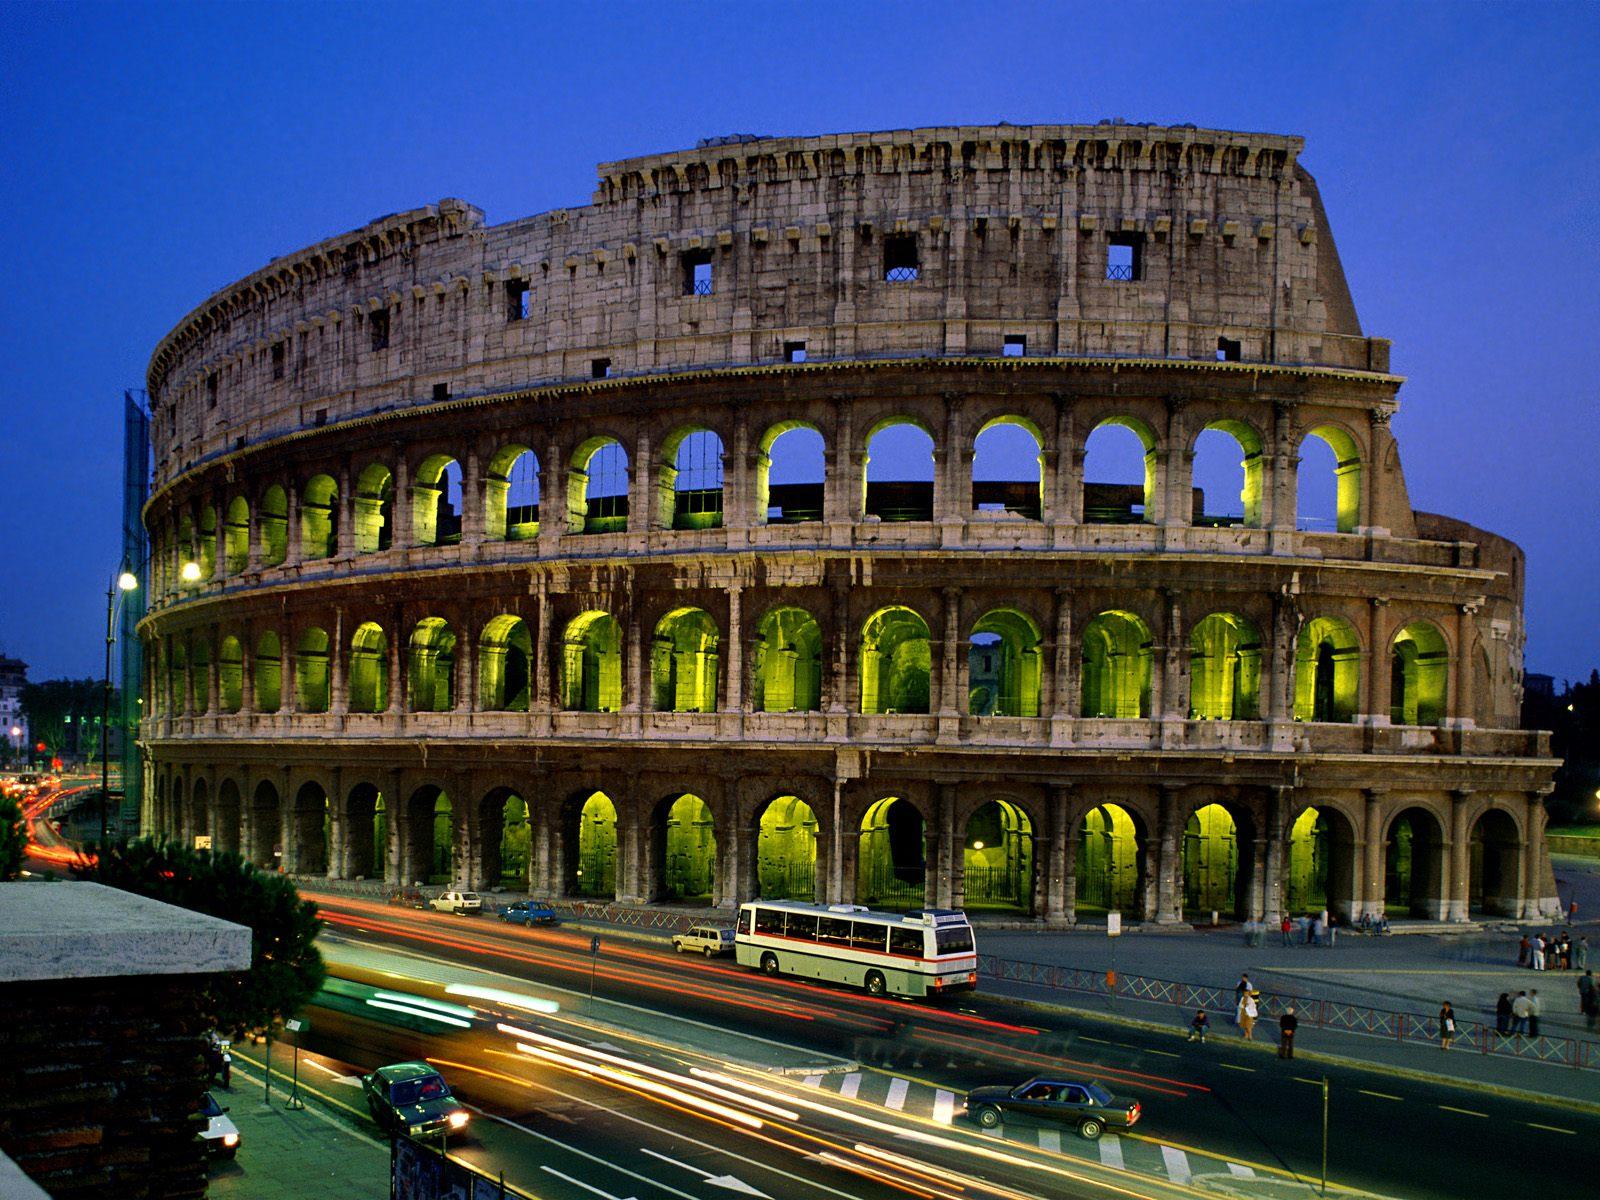 http://2.bp.blogspot.com/-2b5a4YTq12U/T_EgwVkFWkI/AAAAAAAAEUk/3iVCfvH8qKo/s1600/Coliseum,+Rome,+Italy.jpg